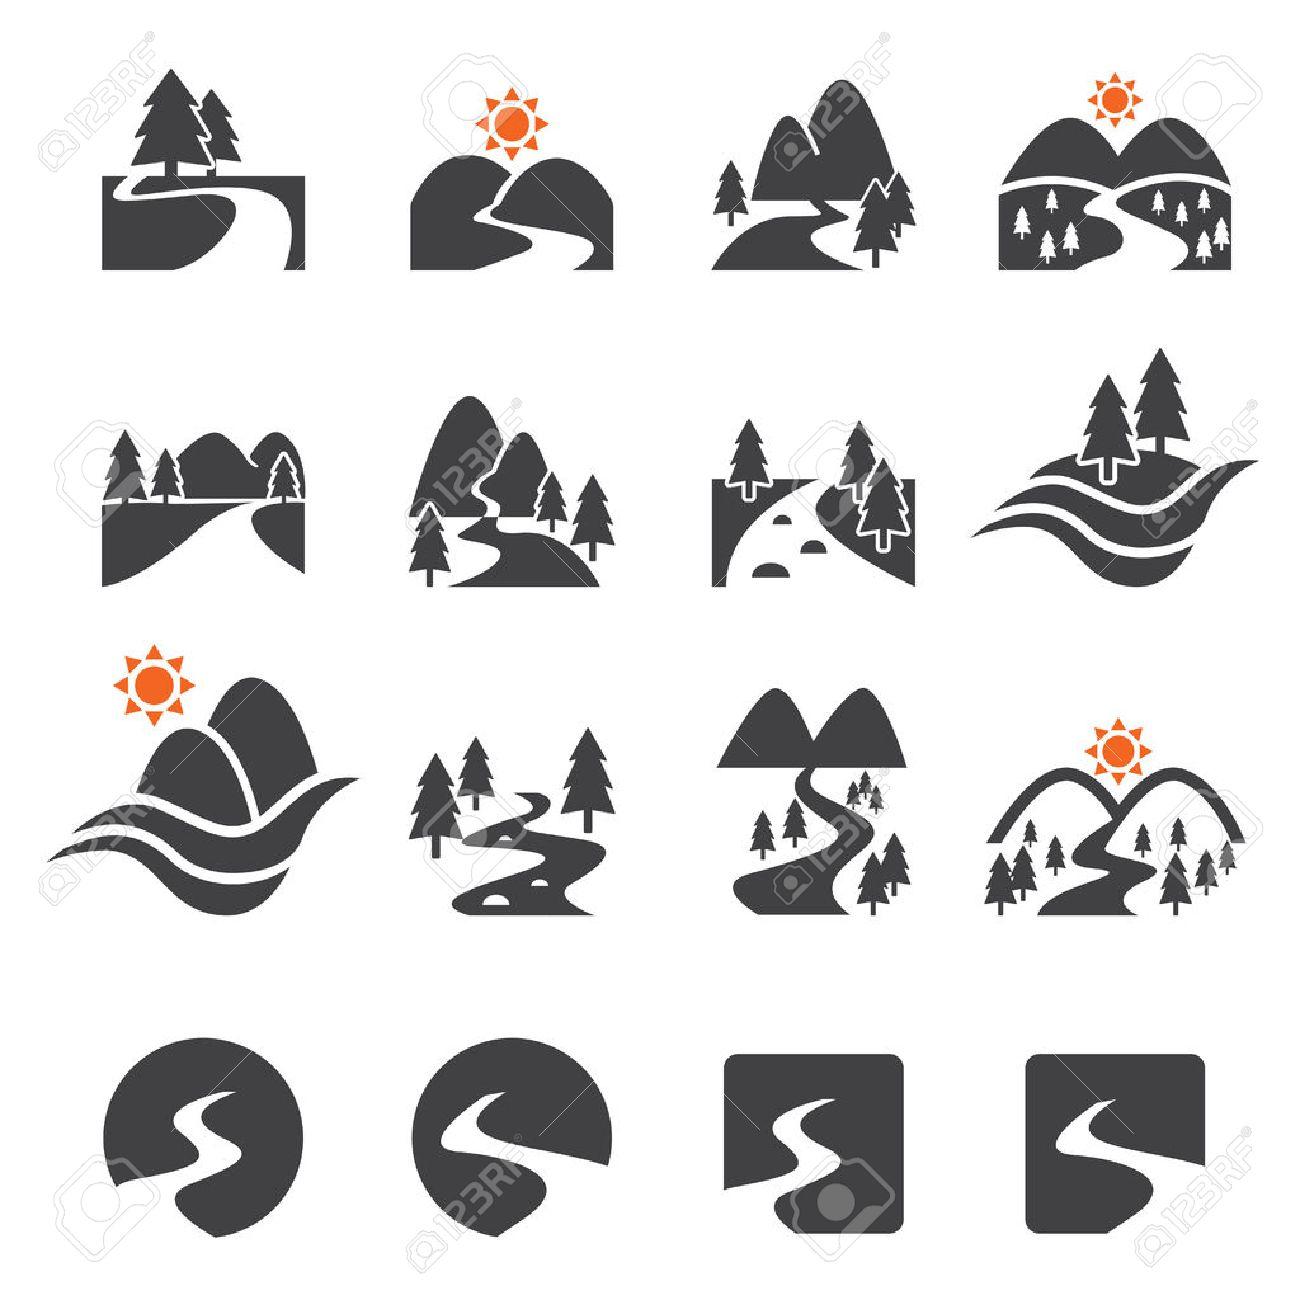 river icon set - 42910242